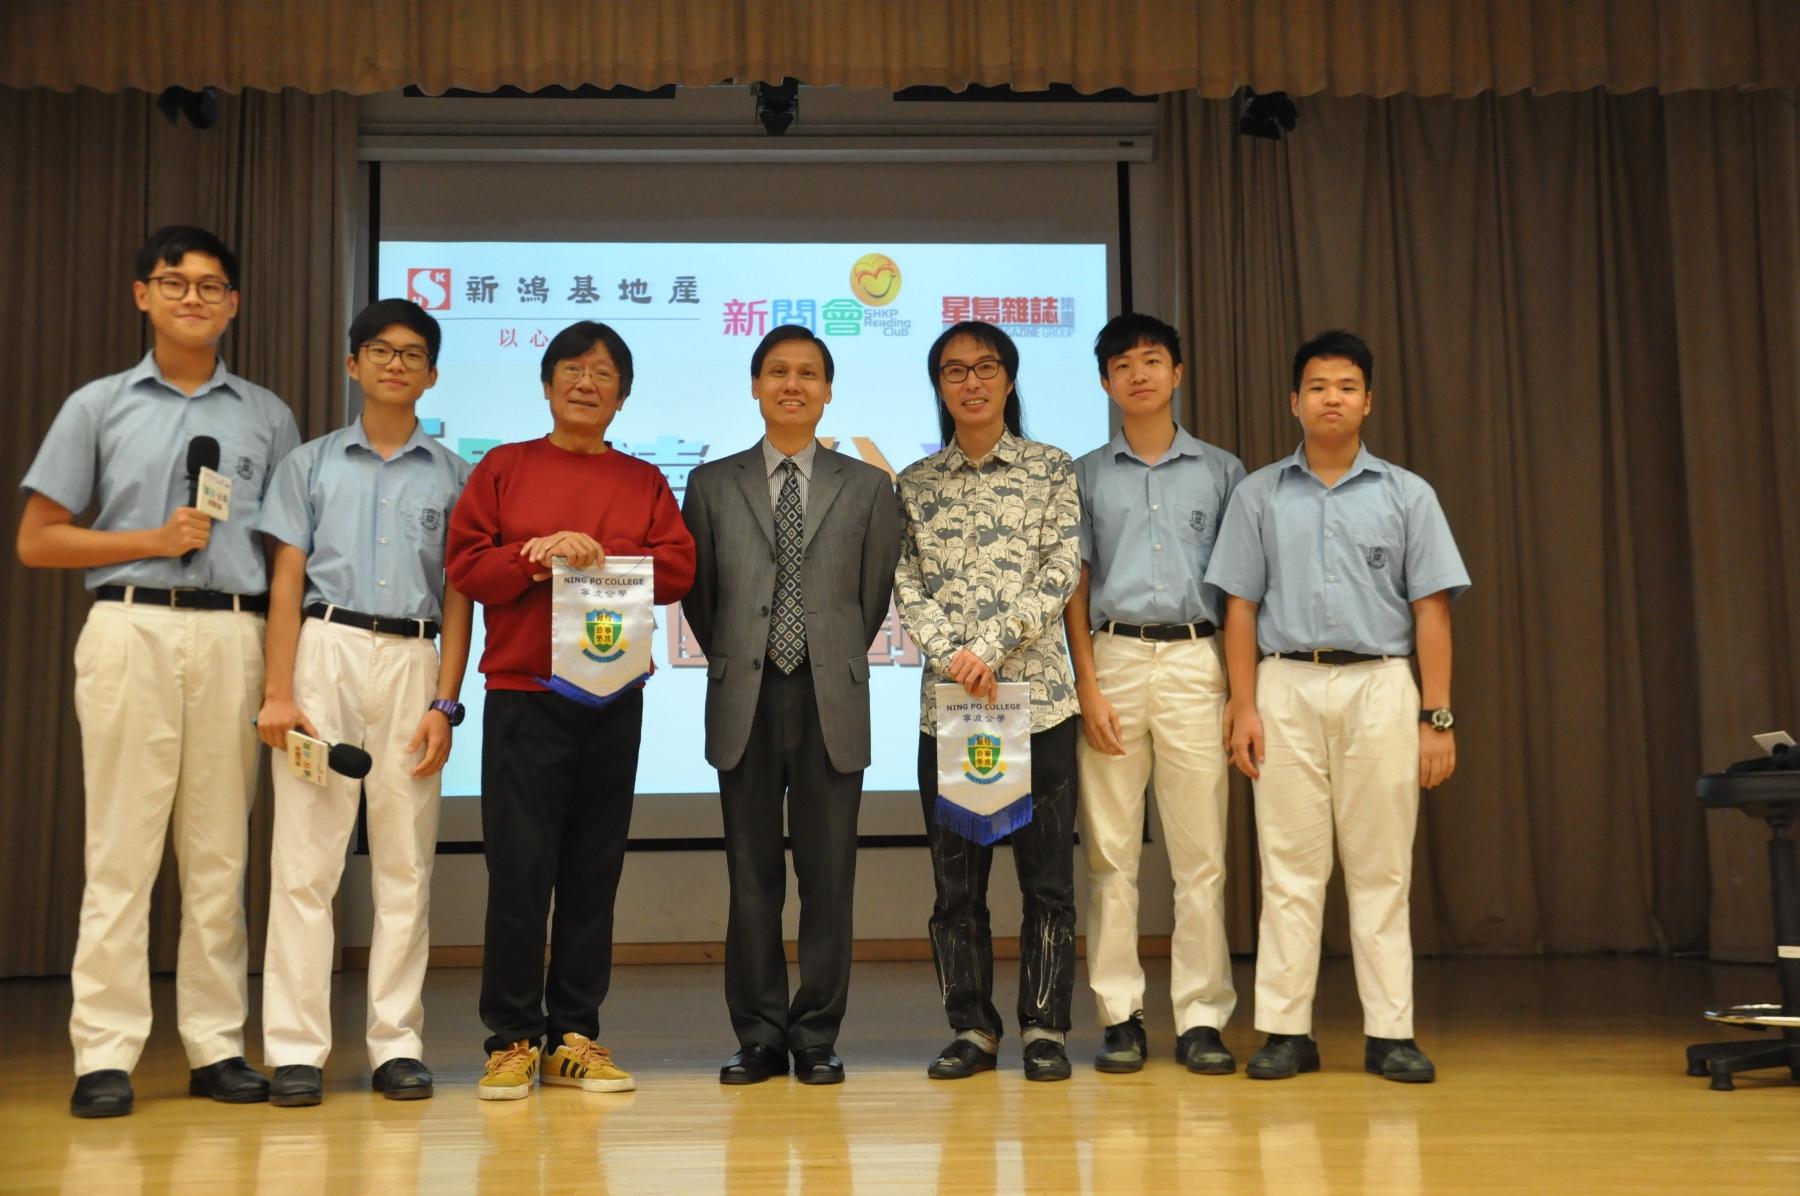 http://www.npc.edu.hk/sites/default/files/dsc_0052.jpg